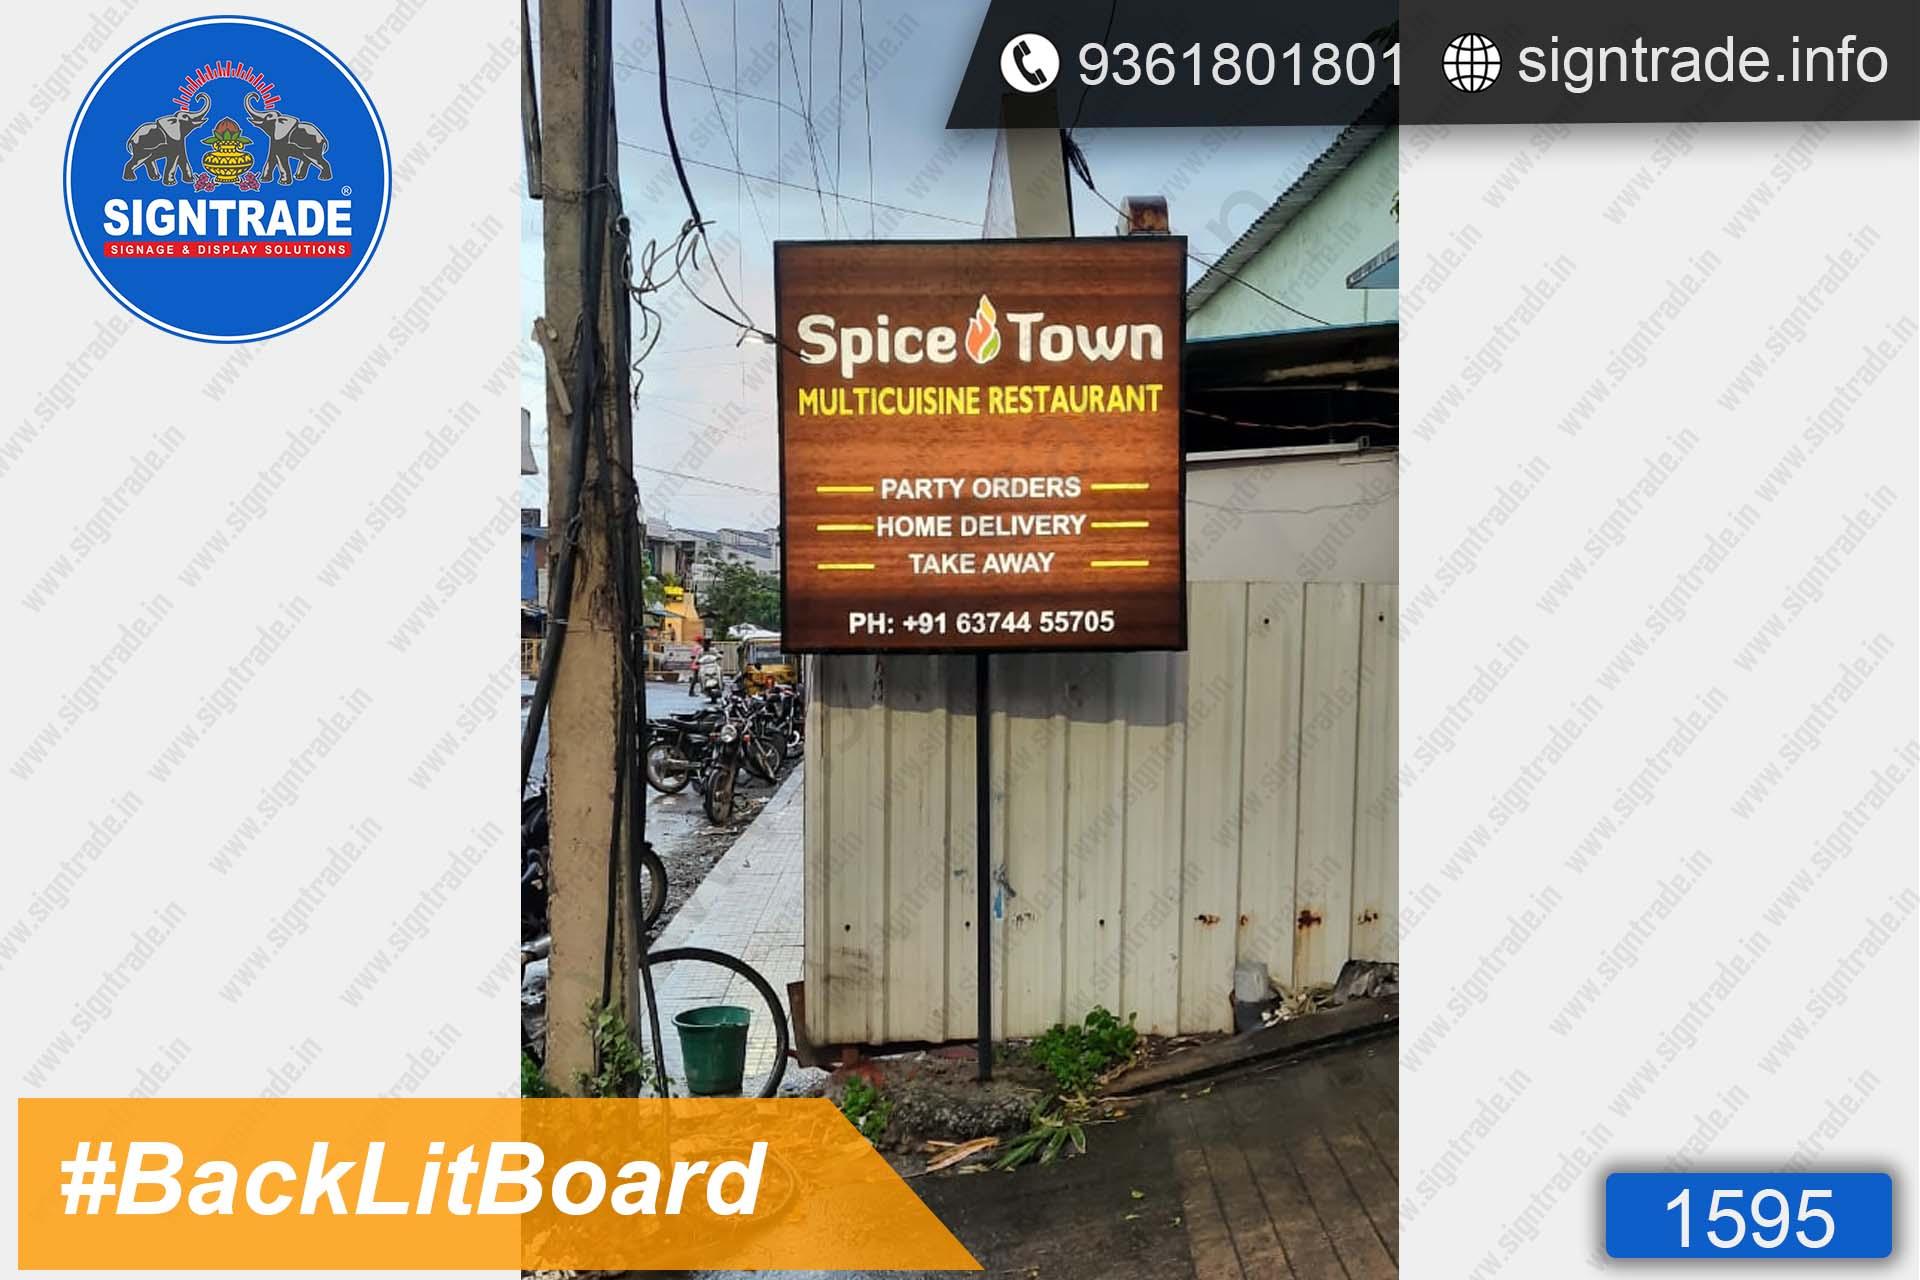 Spicetown Multicuisine Restaurant, Chennai - SIGNTRADE - Digital Flex Printing Service - Backlit Flex Board Manufacturers in Chennai